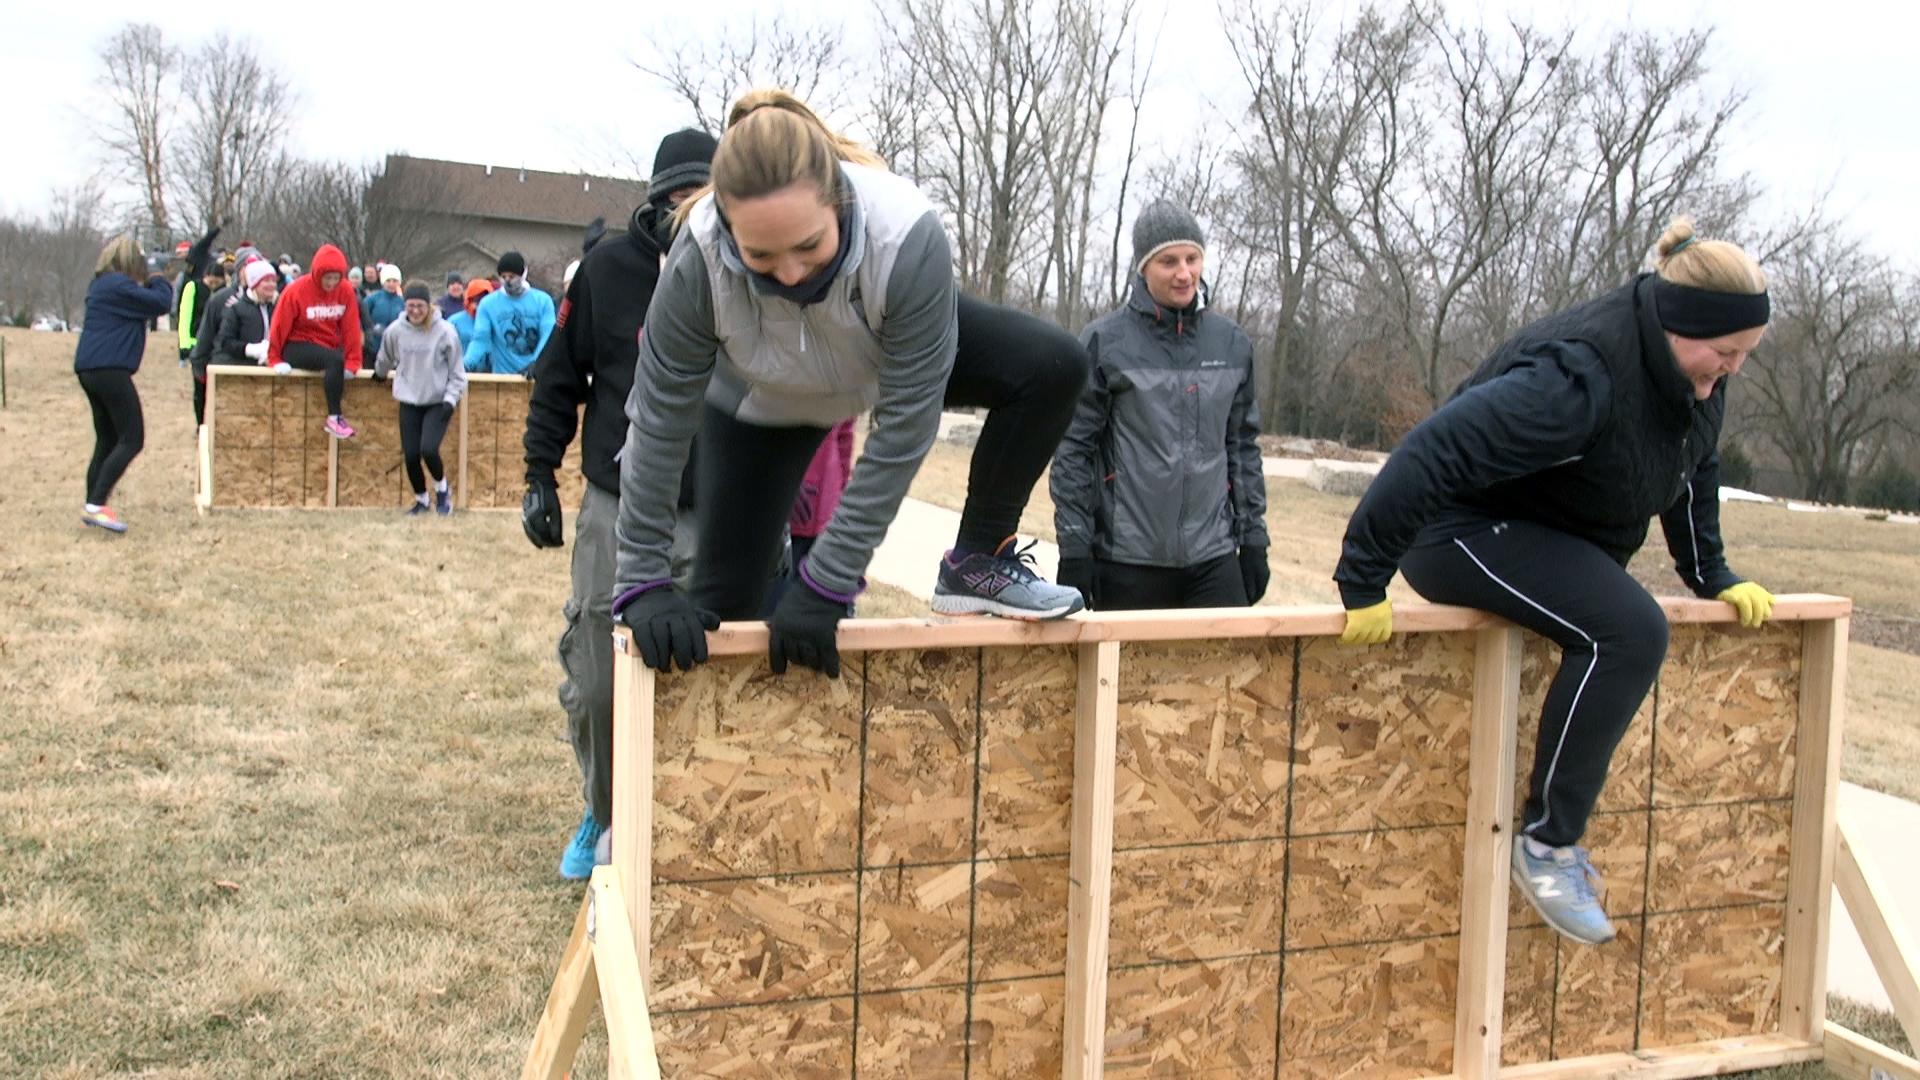 5k hurdles